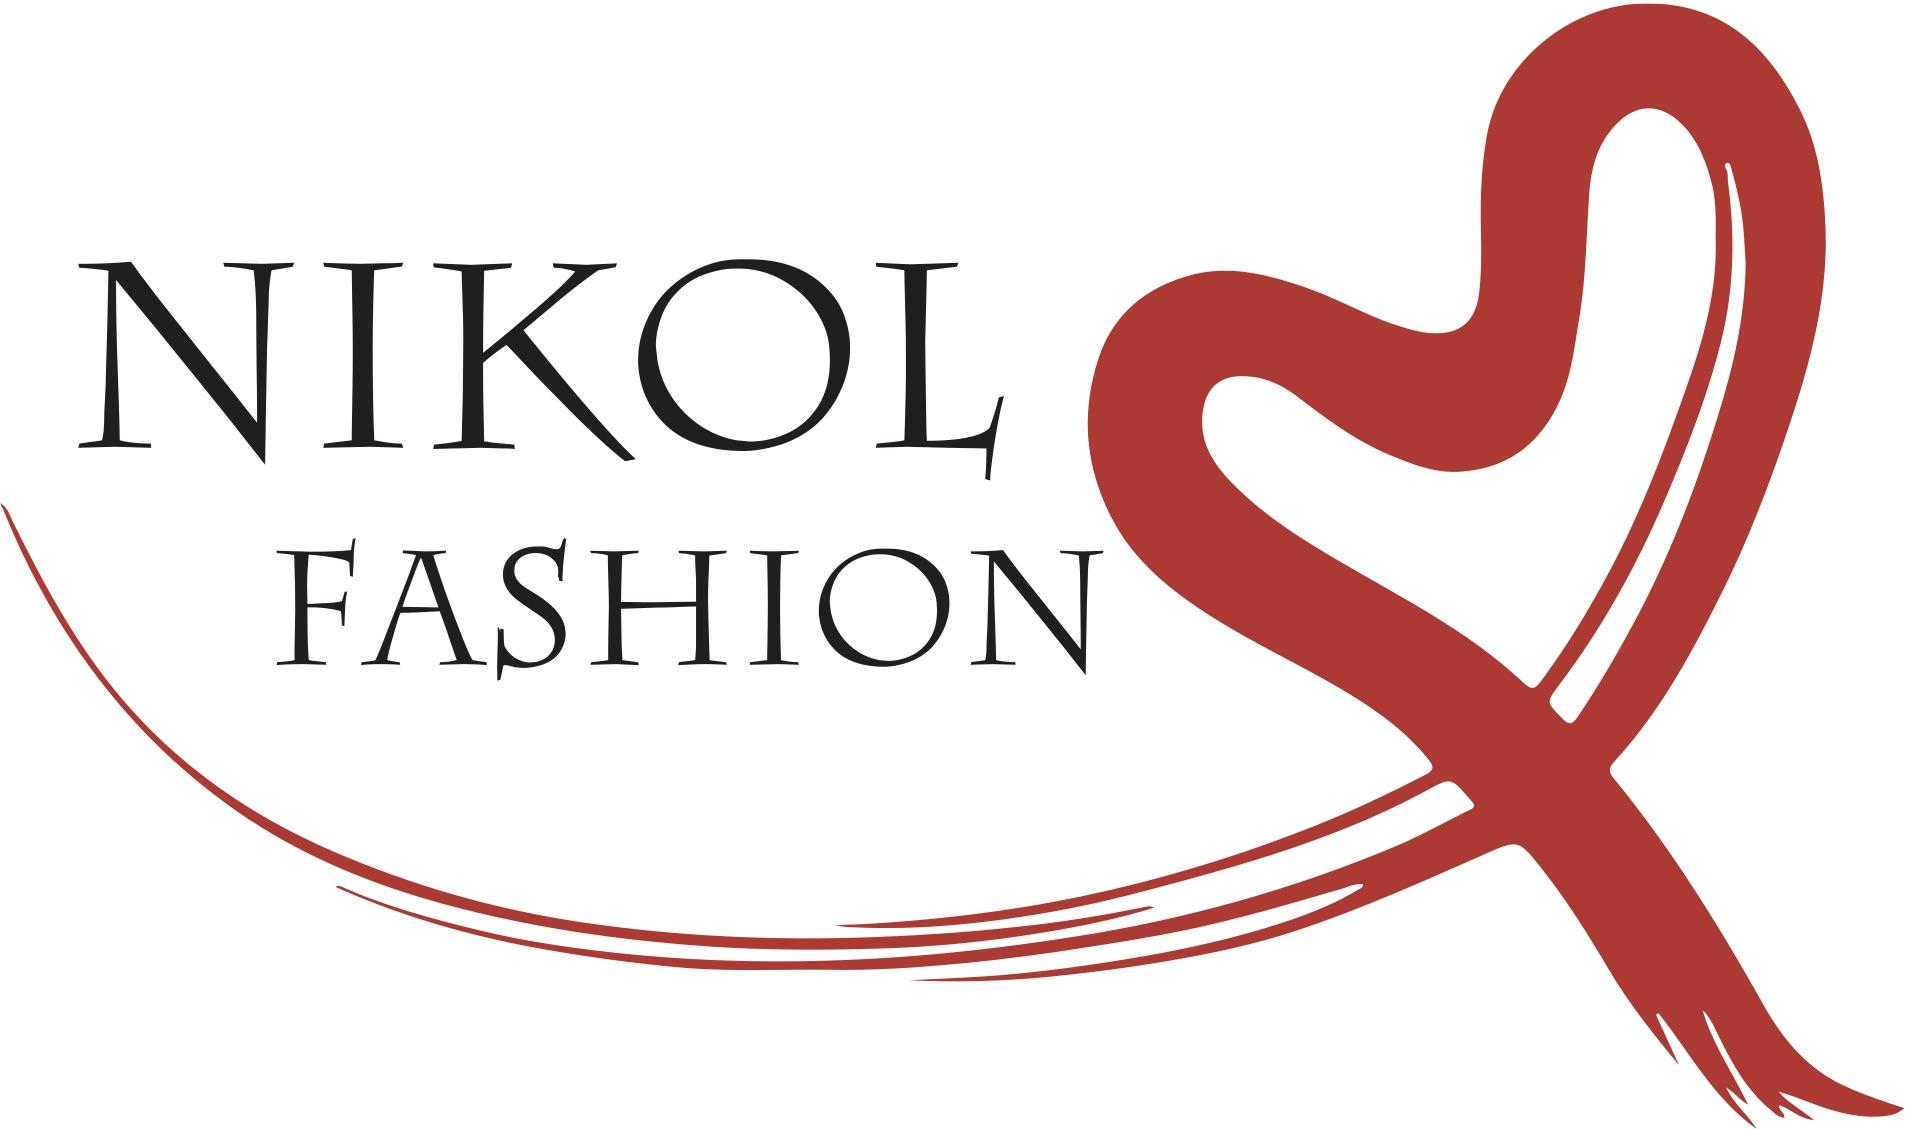 Nikol Fashion